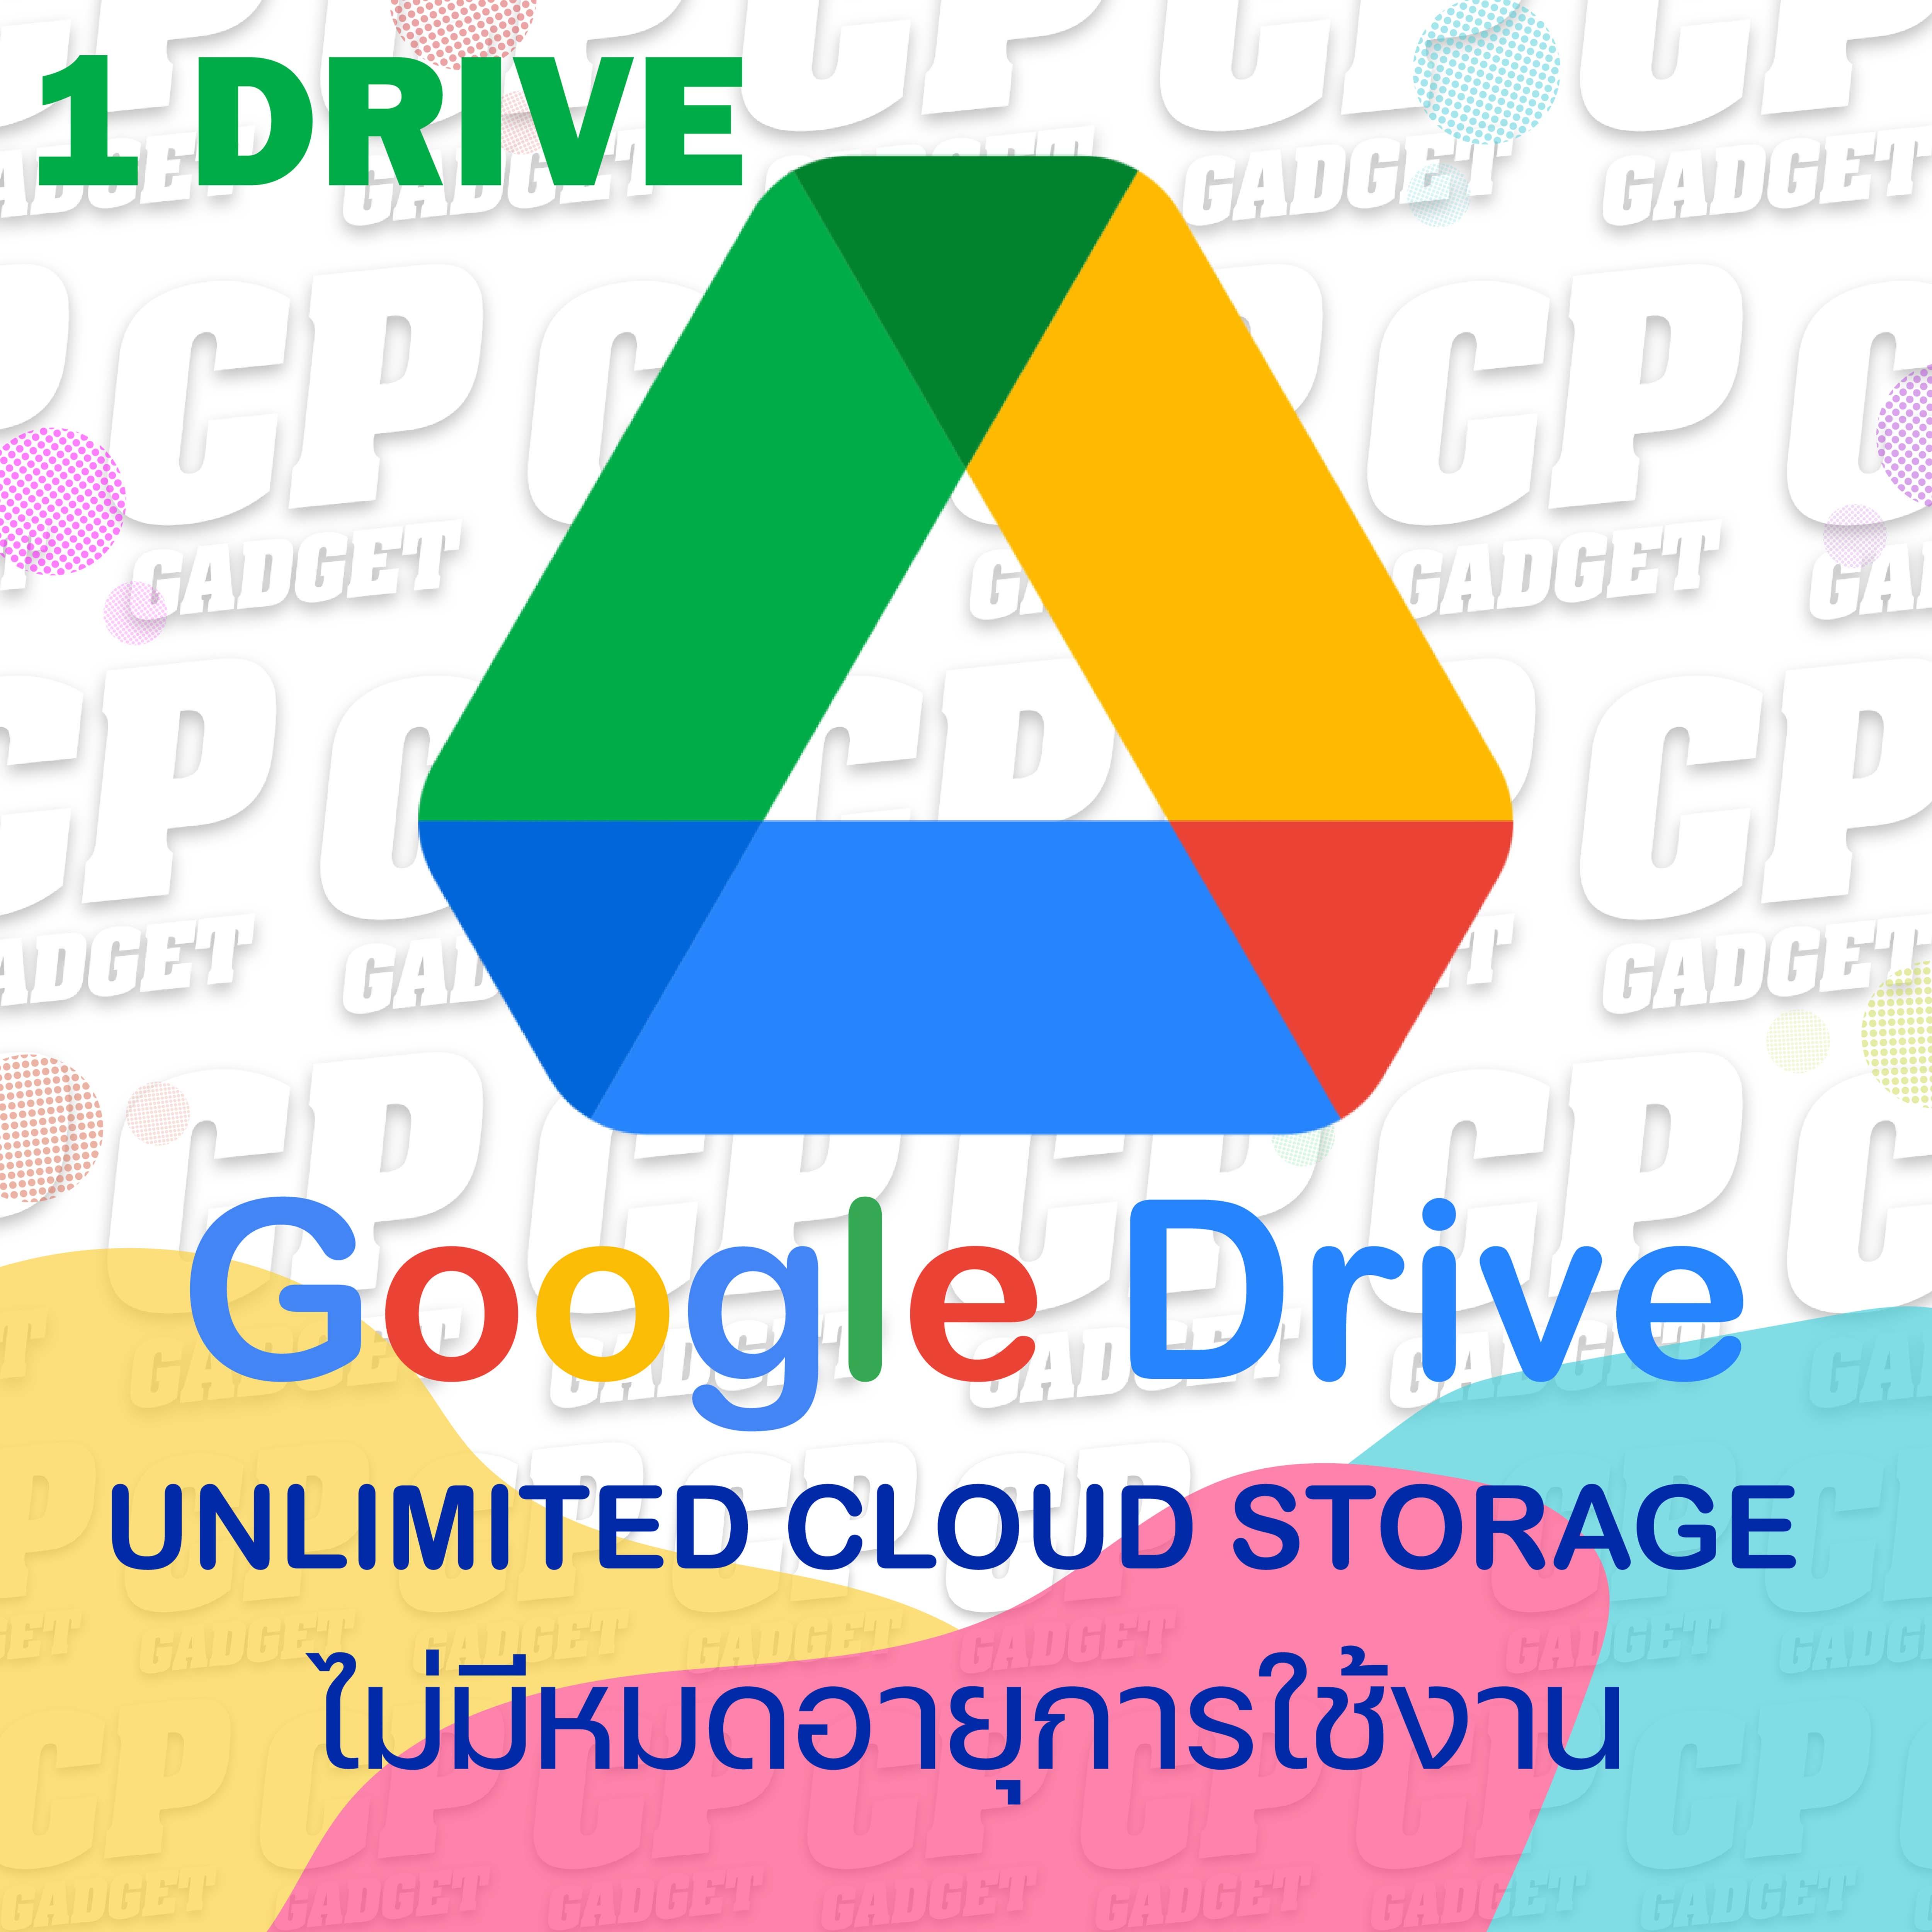 ✅ Google Share Drive ไดรฟ์ไม่จำกัดพื้นที่ ตลอดอายุการใช้งาน (จำนวน 1 ไดรฟ์).